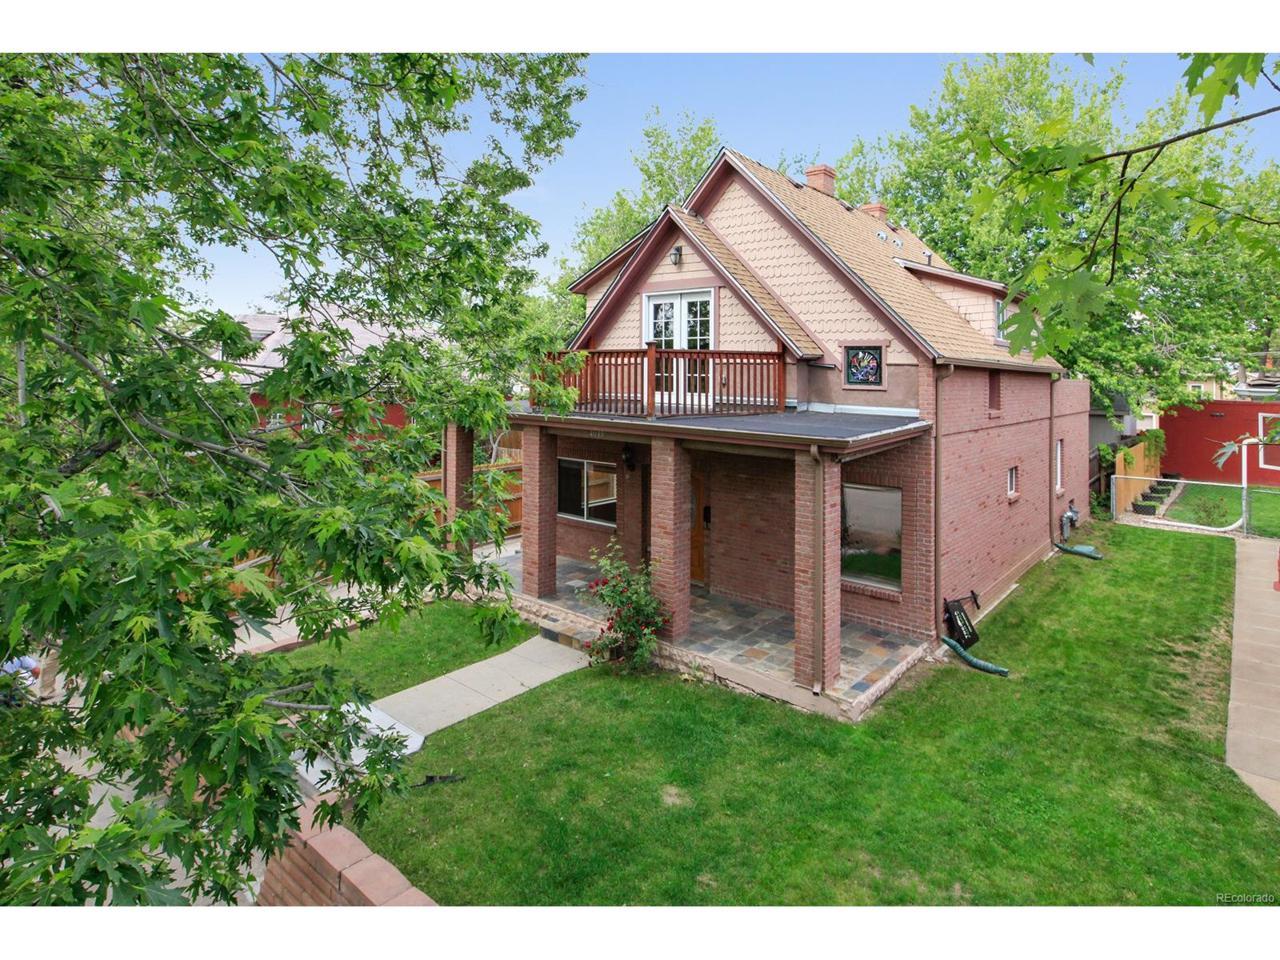 4039 Wyandot Street, Denver, CO 80211 (MLS #3052196) :: 8z Real Estate